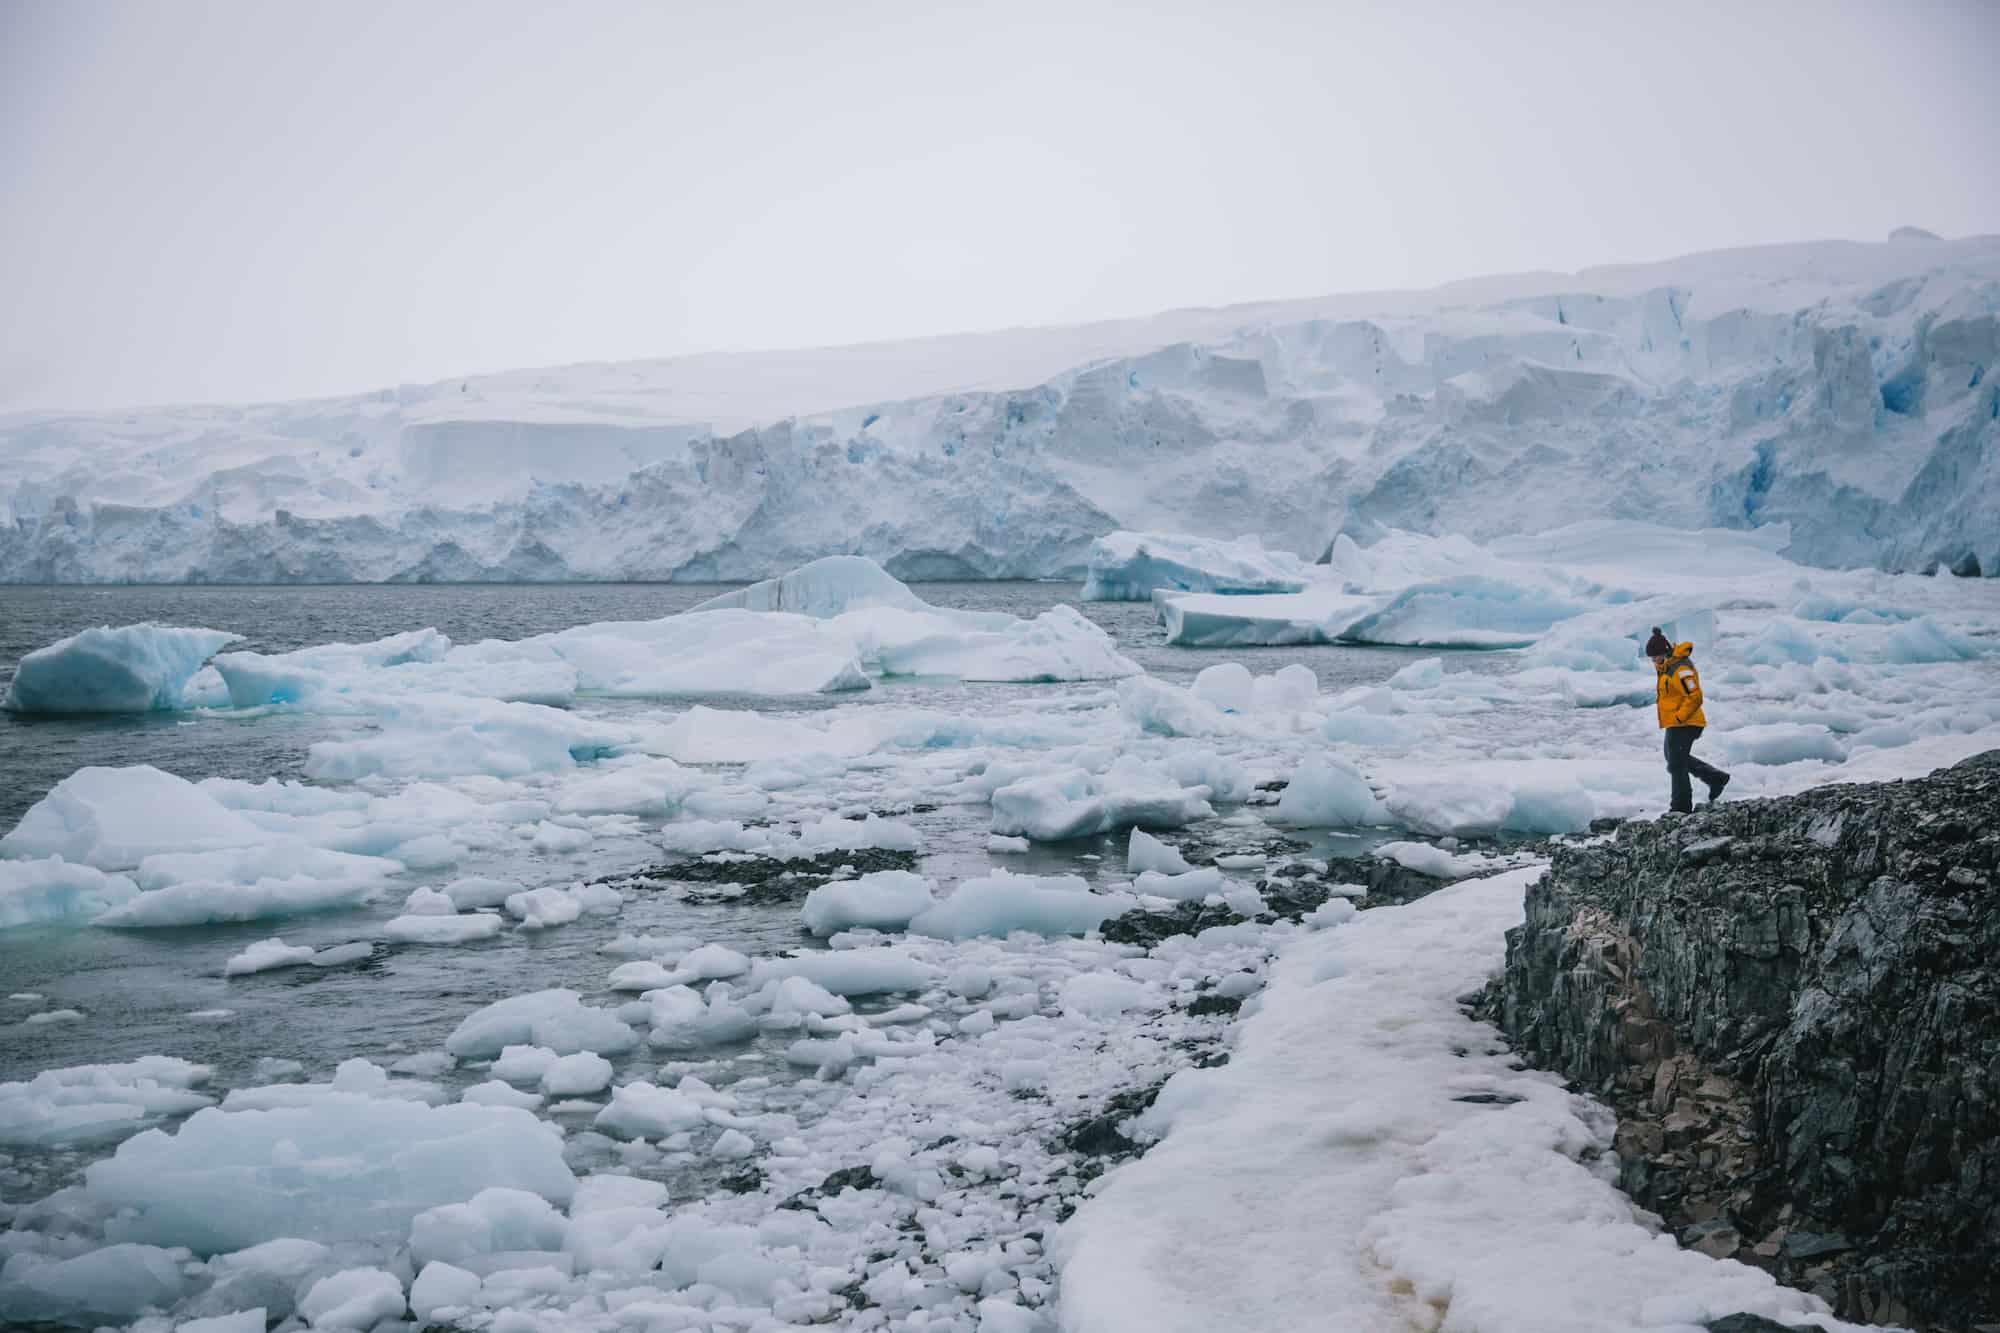 antarctica packing